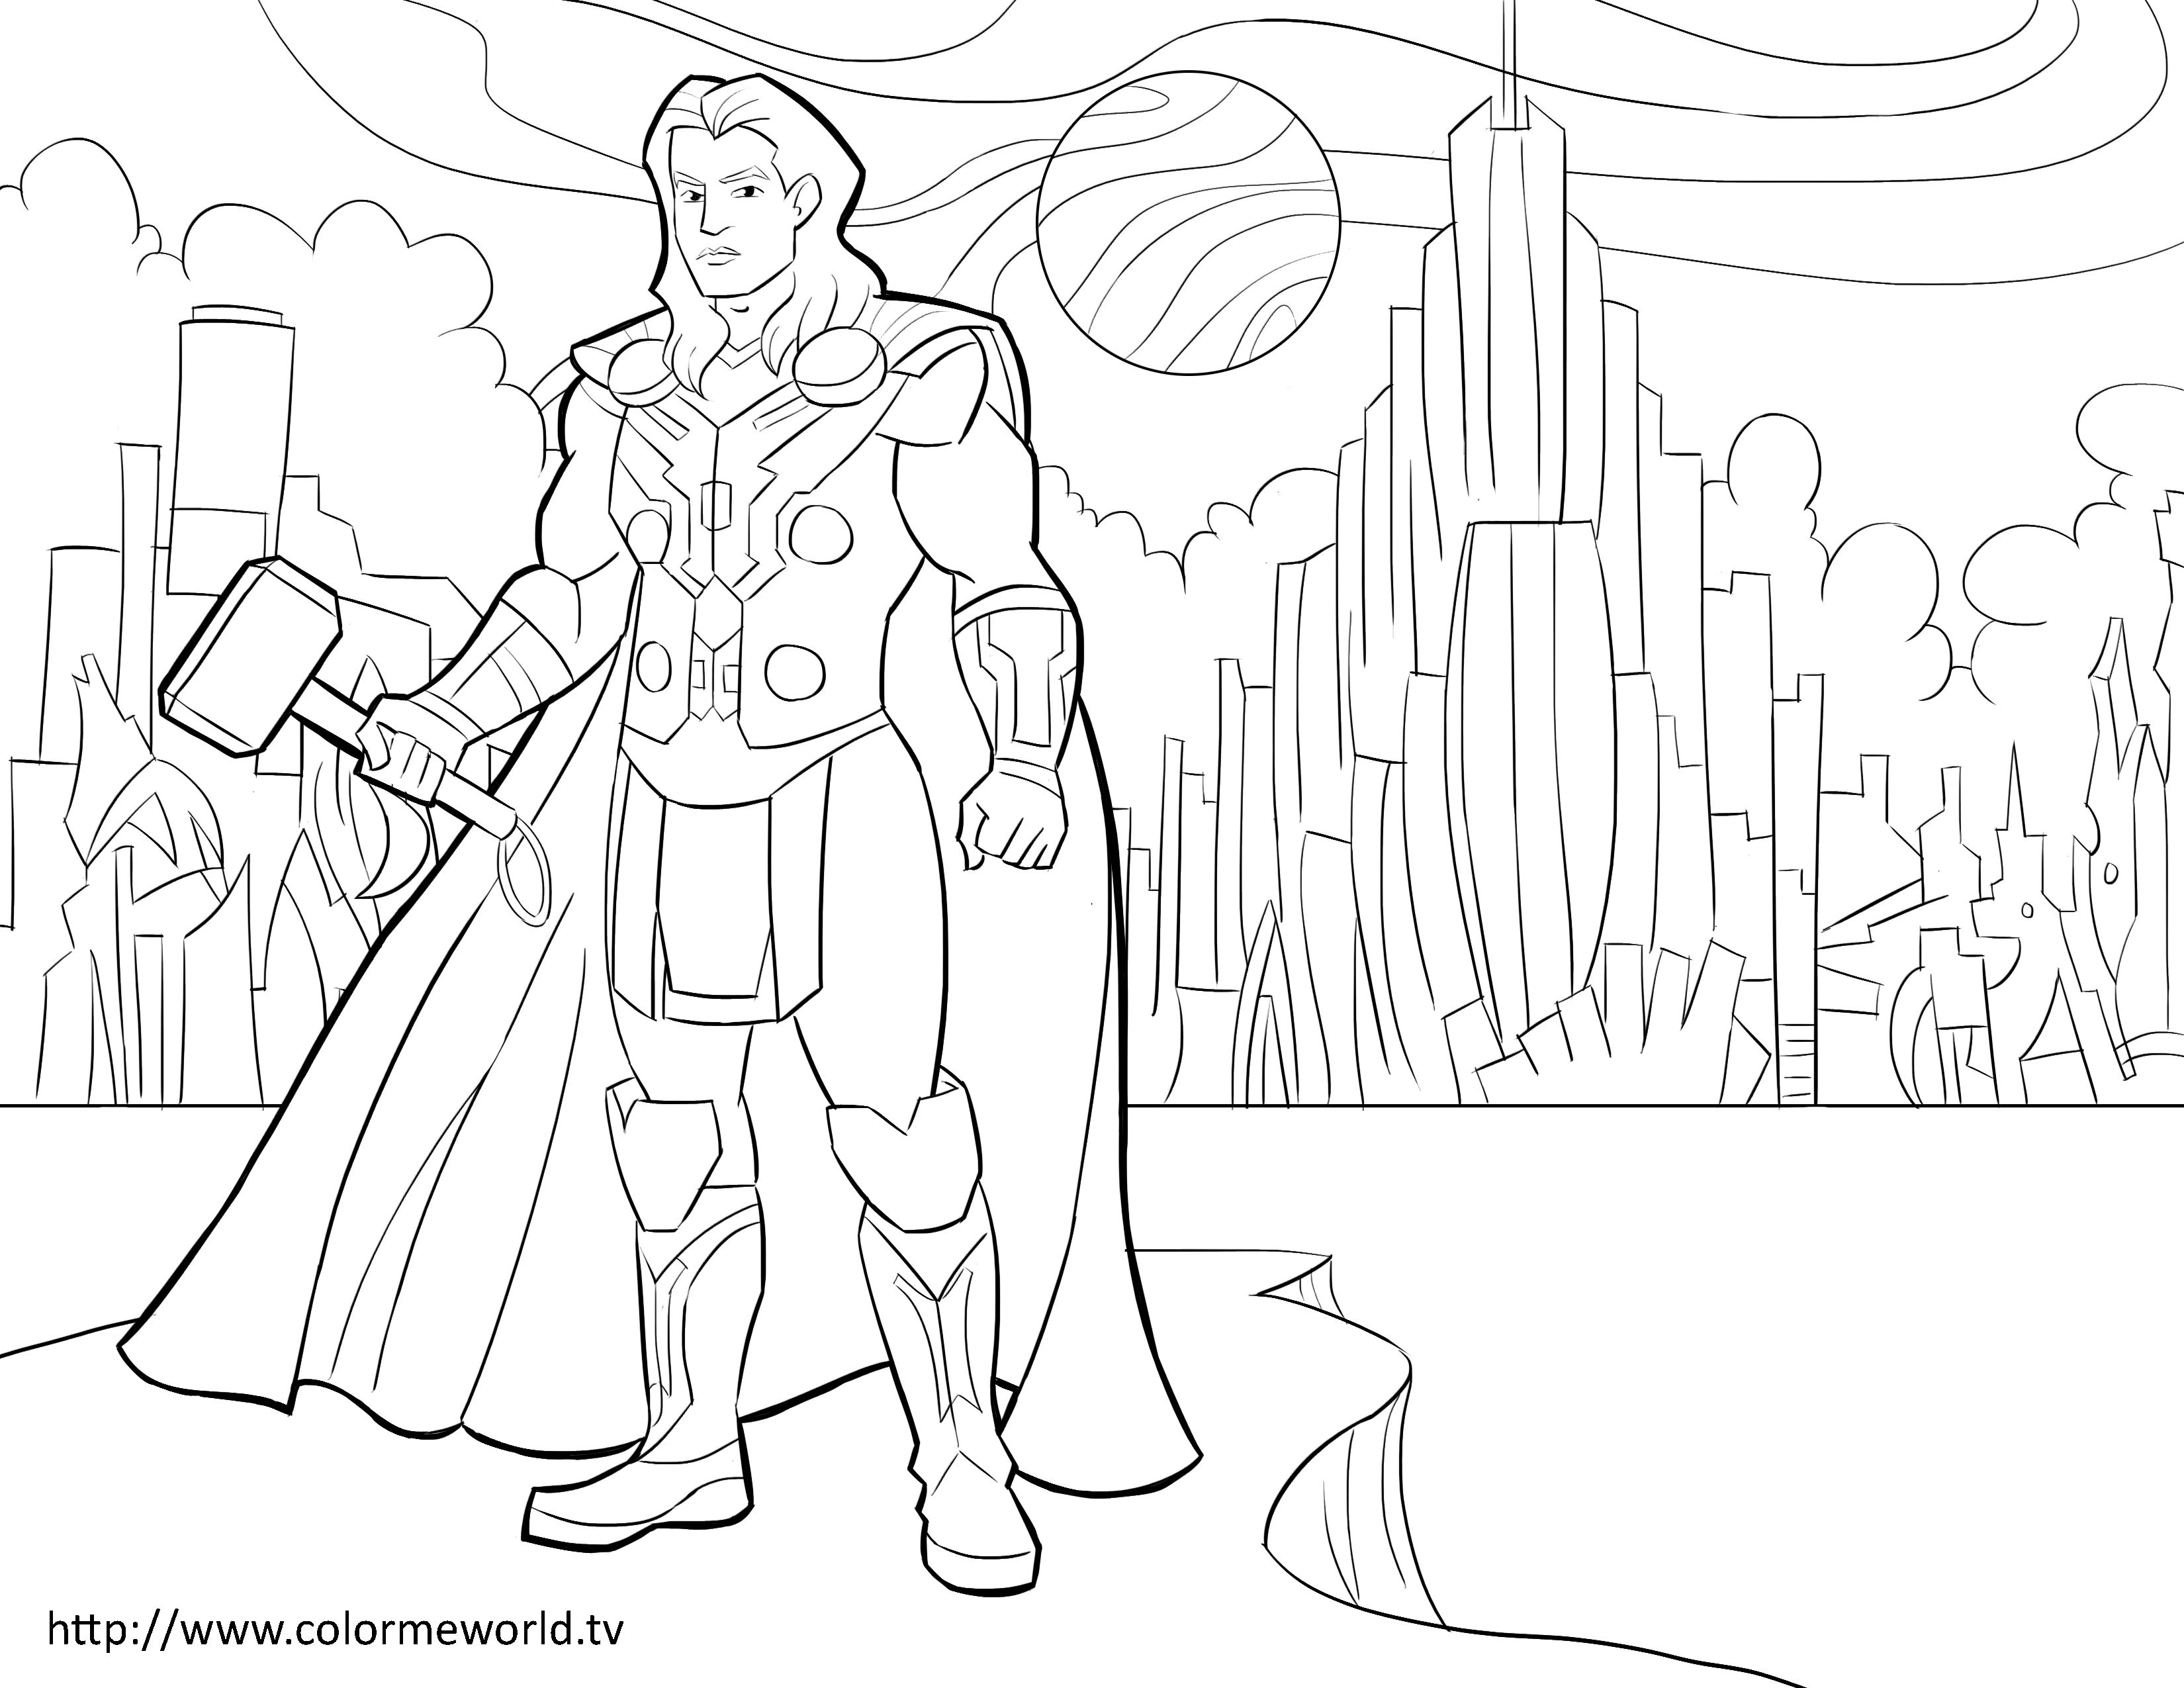 Dibujos Para Pintar De Avengers End Game Dibujos Para